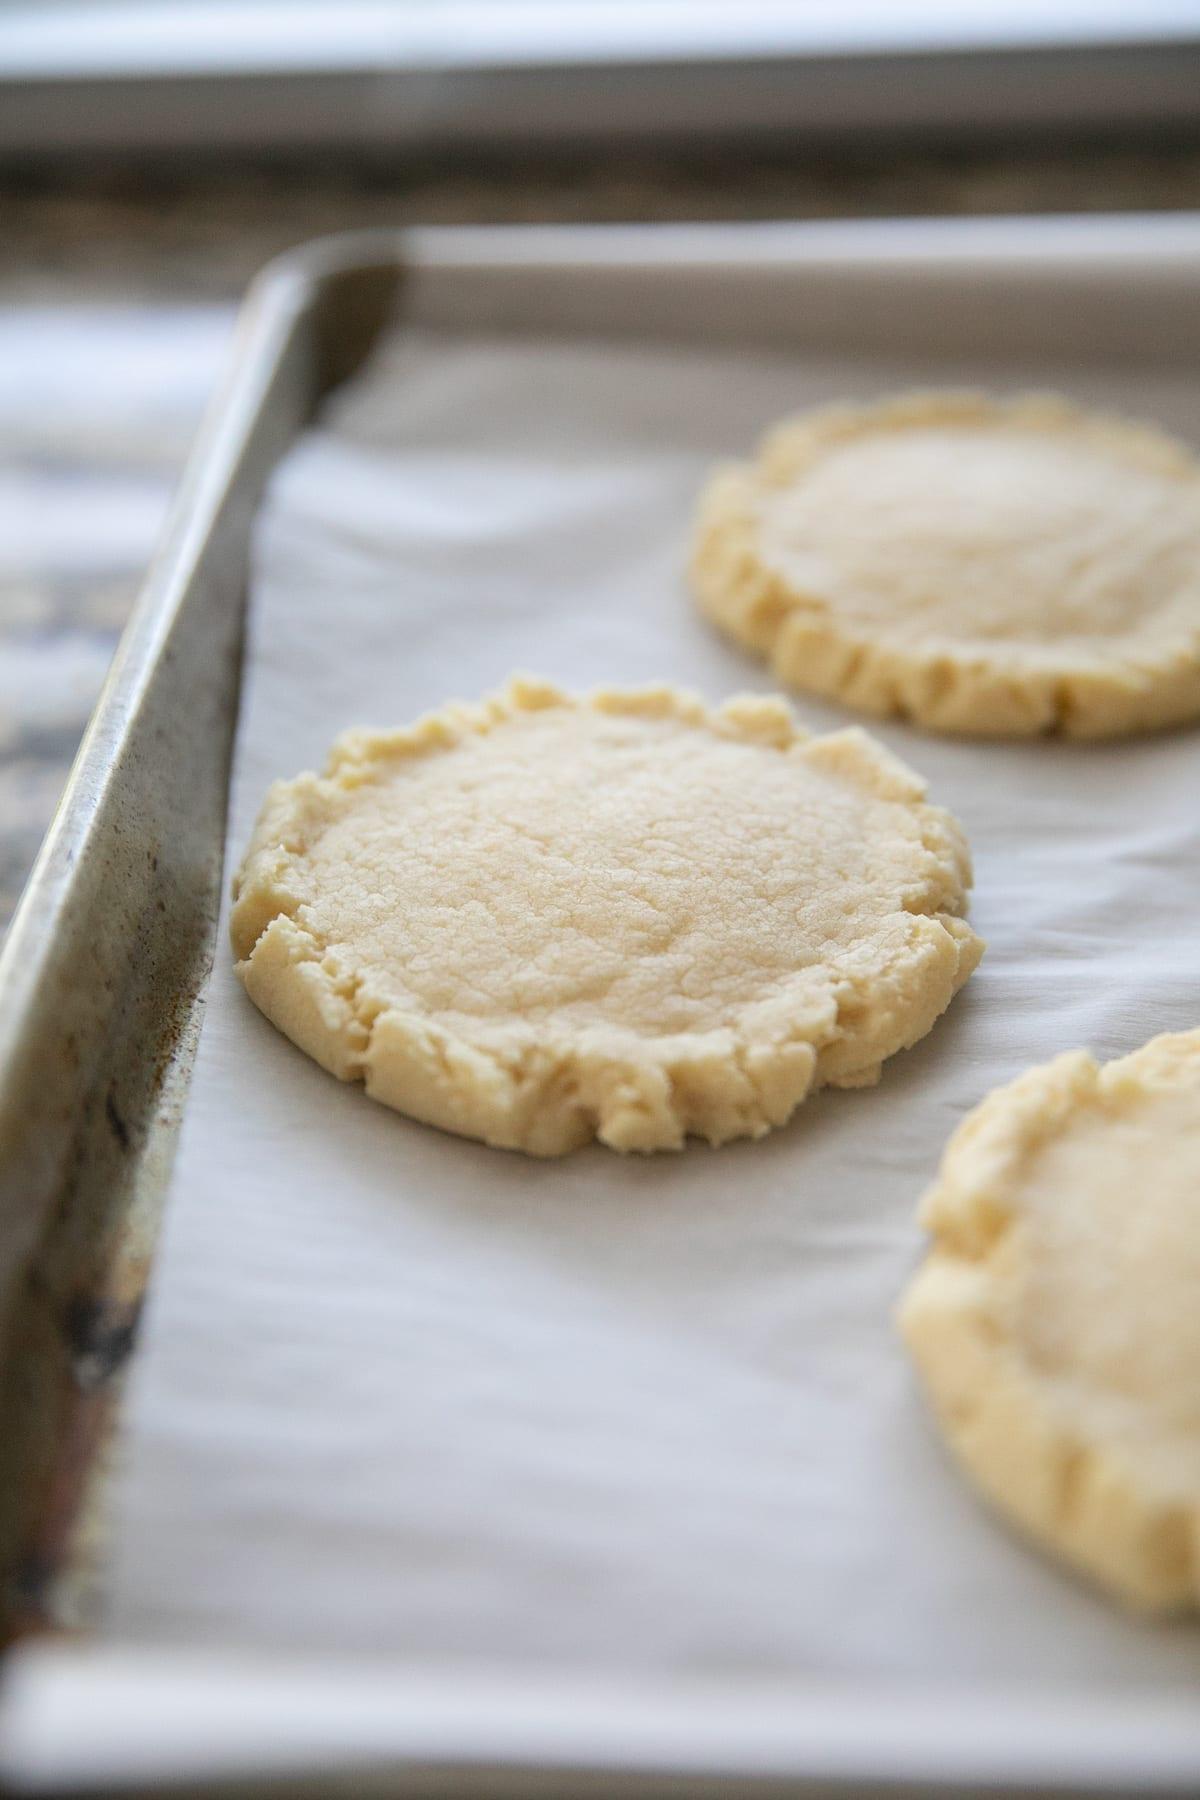 baked cookies on baking sheet